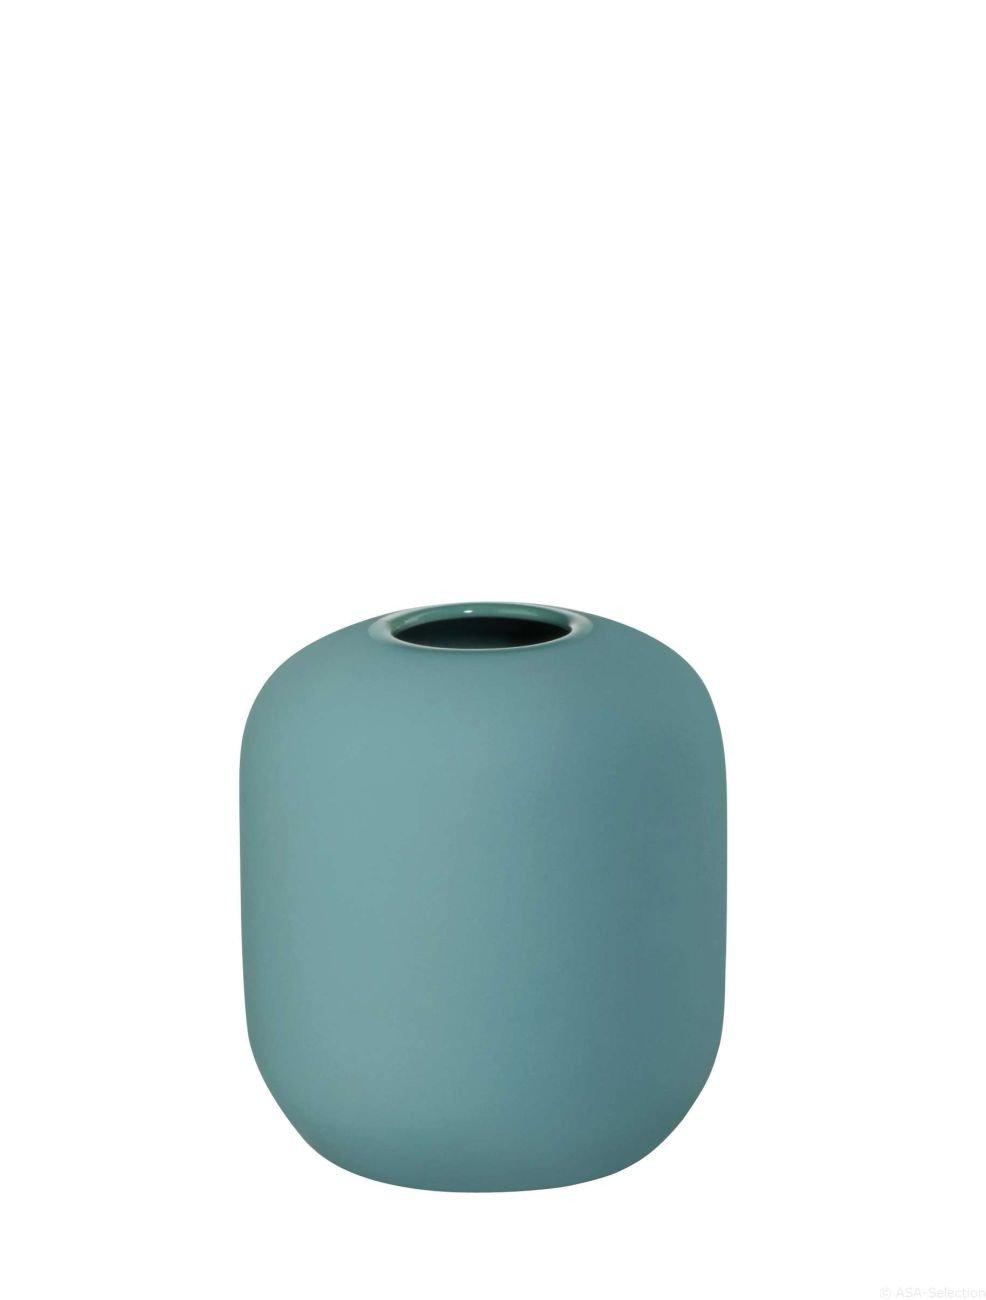 Vase Blue Lagoon Asa Selection